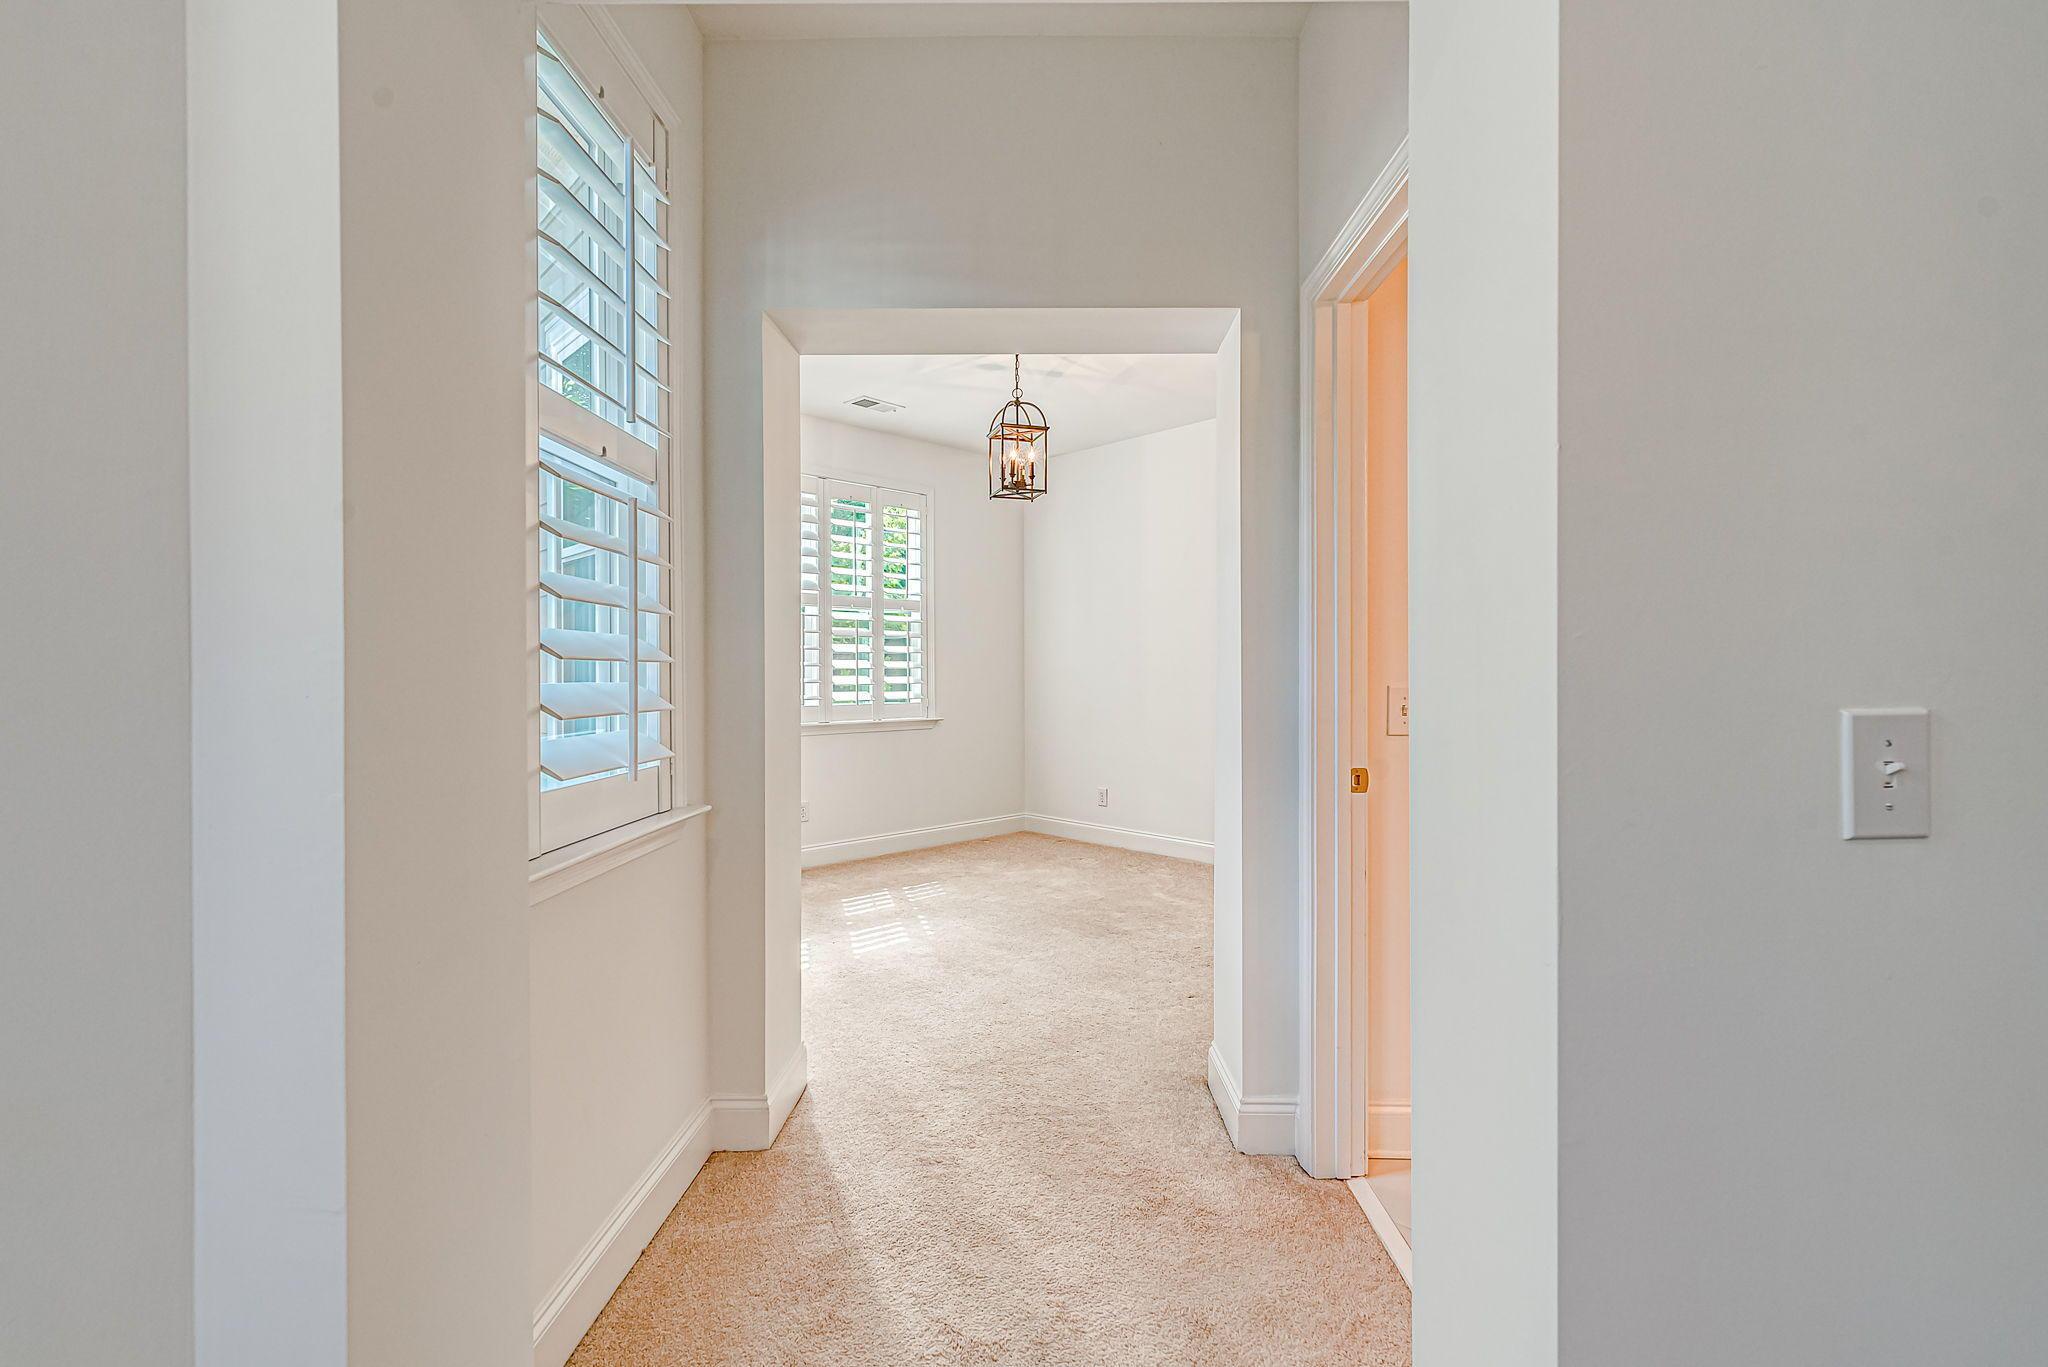 Dunes West Homes For Sale - 2476 Kings Gate, Mount Pleasant, SC - 18